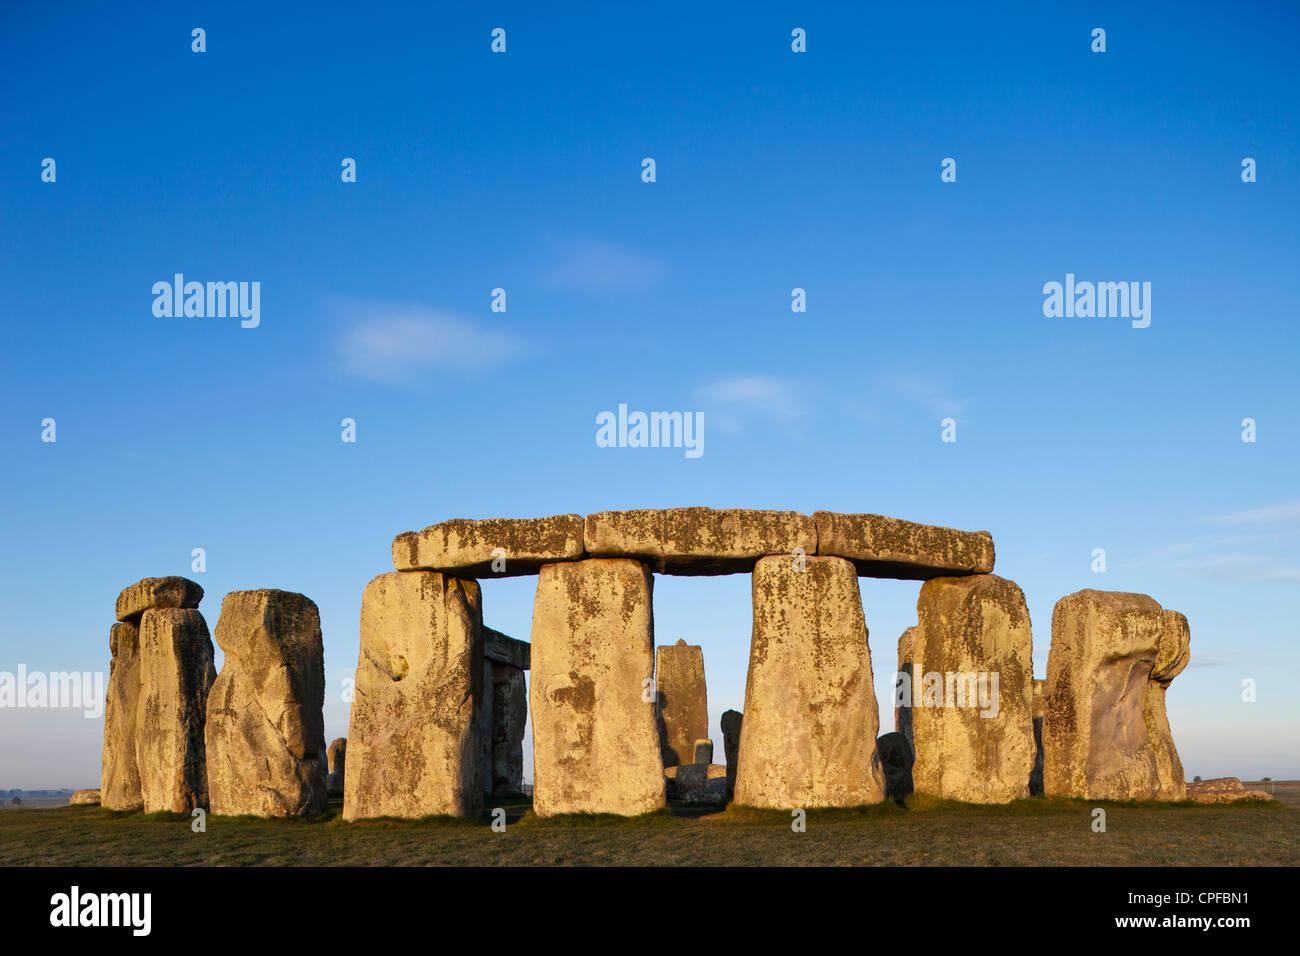 Inghilterra, Wiltshire, Stonehenge Foto Stock